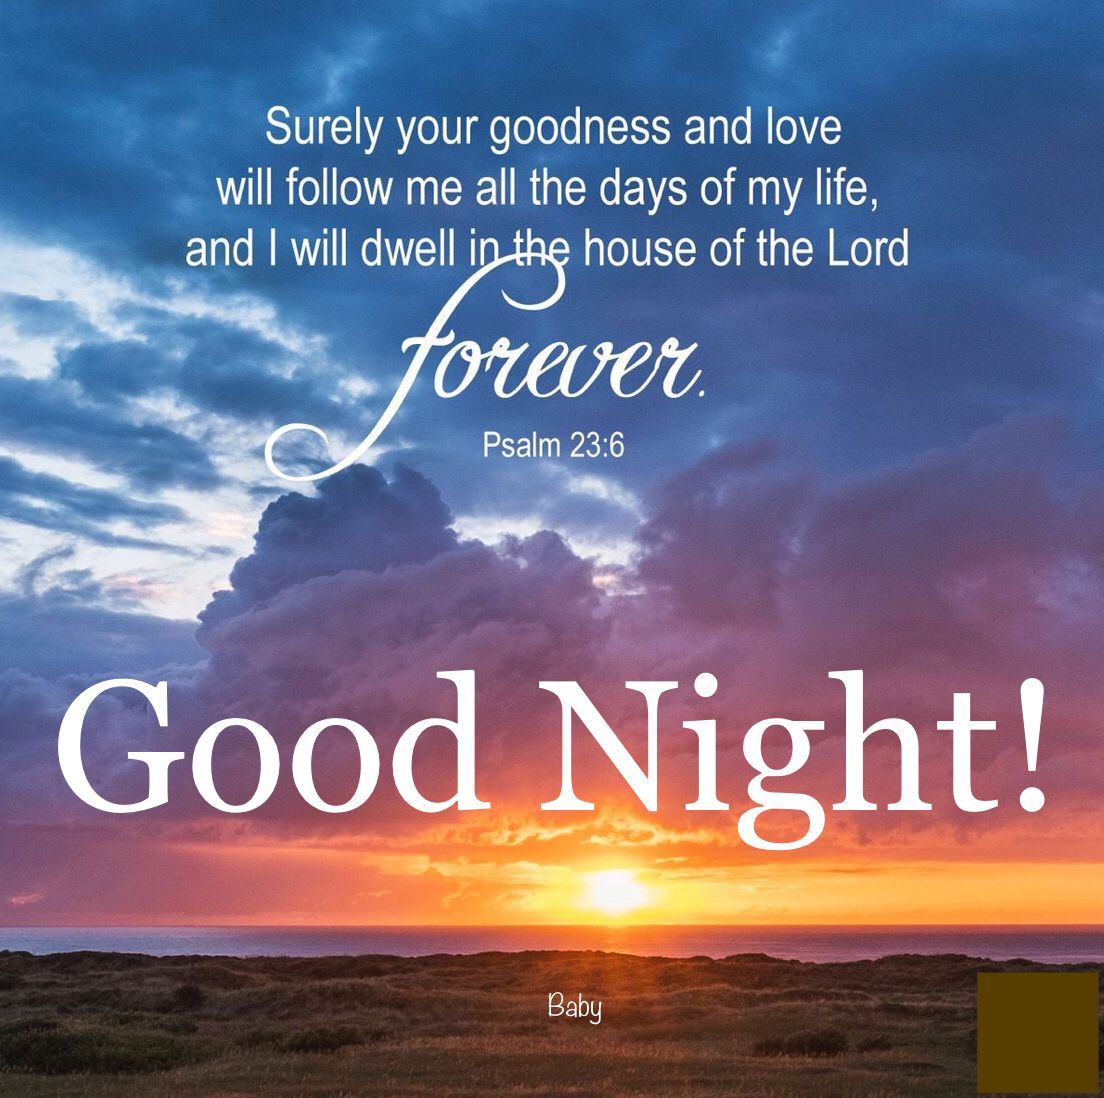 Good Night! | Good night prayer, Good night quotes, Good night bible verse